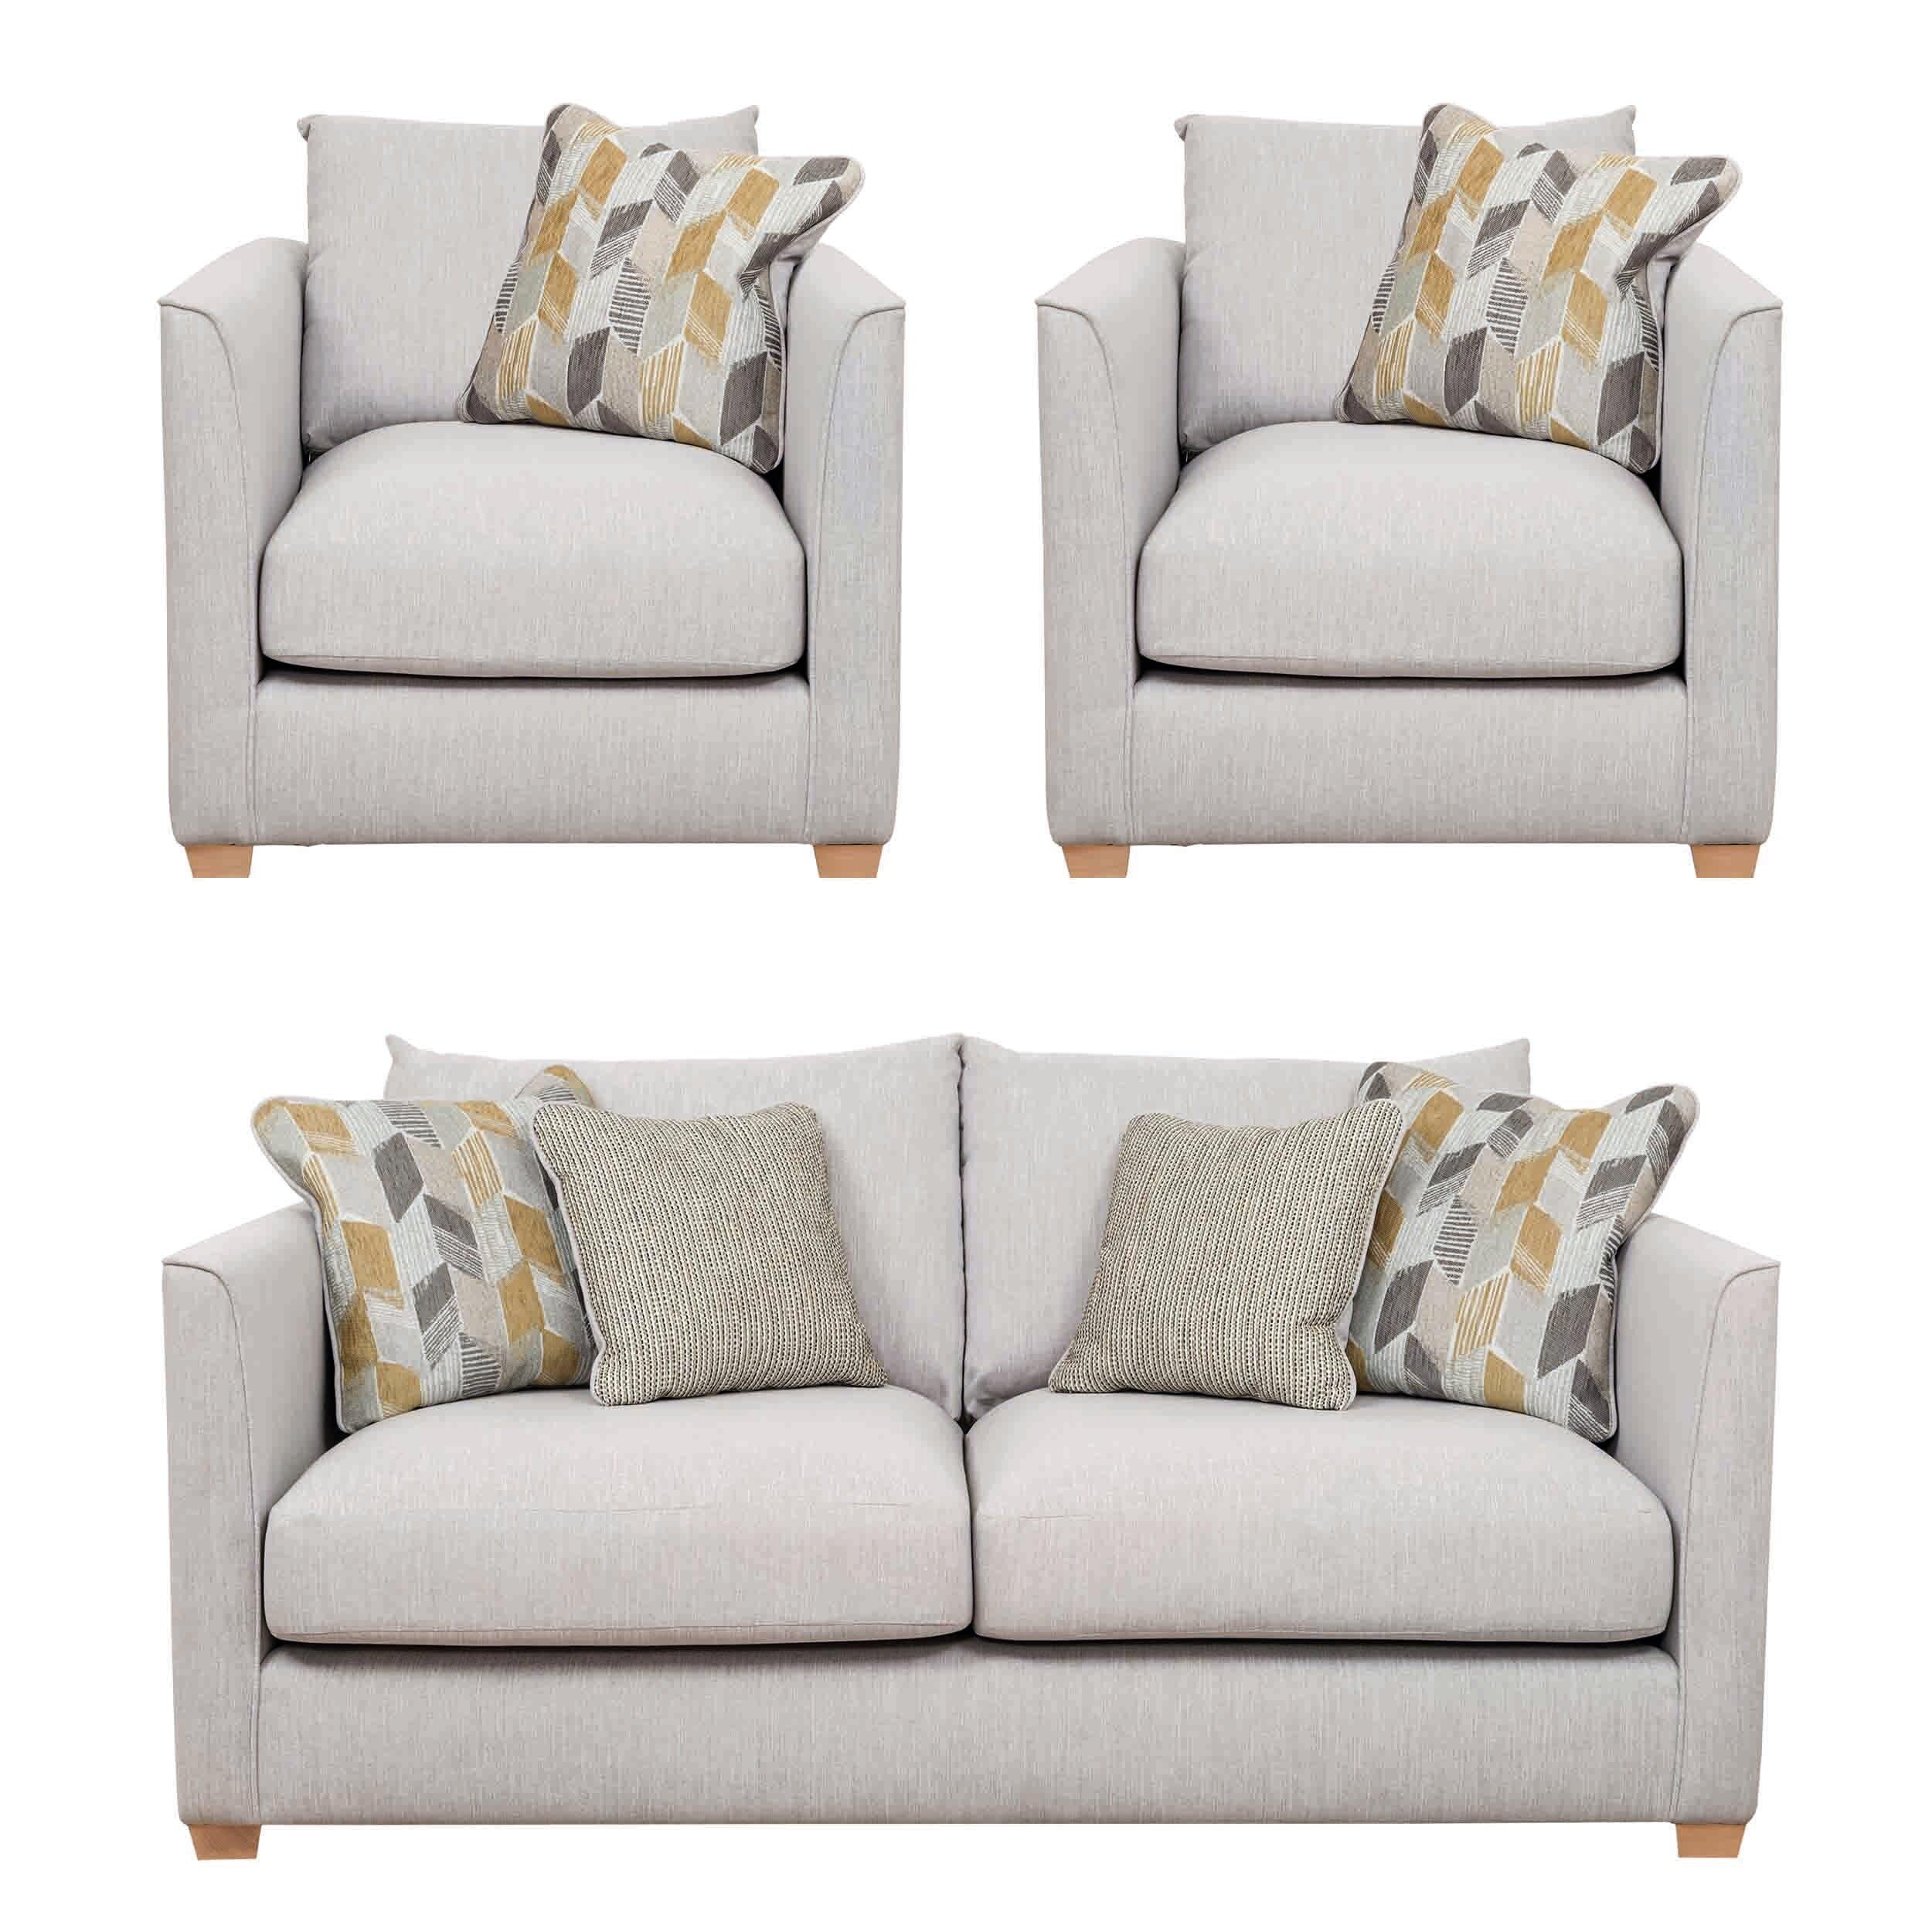 Remarkable Friel 3 Piece Sofa Set Unemploymentrelief Wooden Chair Designs For Living Room Unemploymentrelieforg